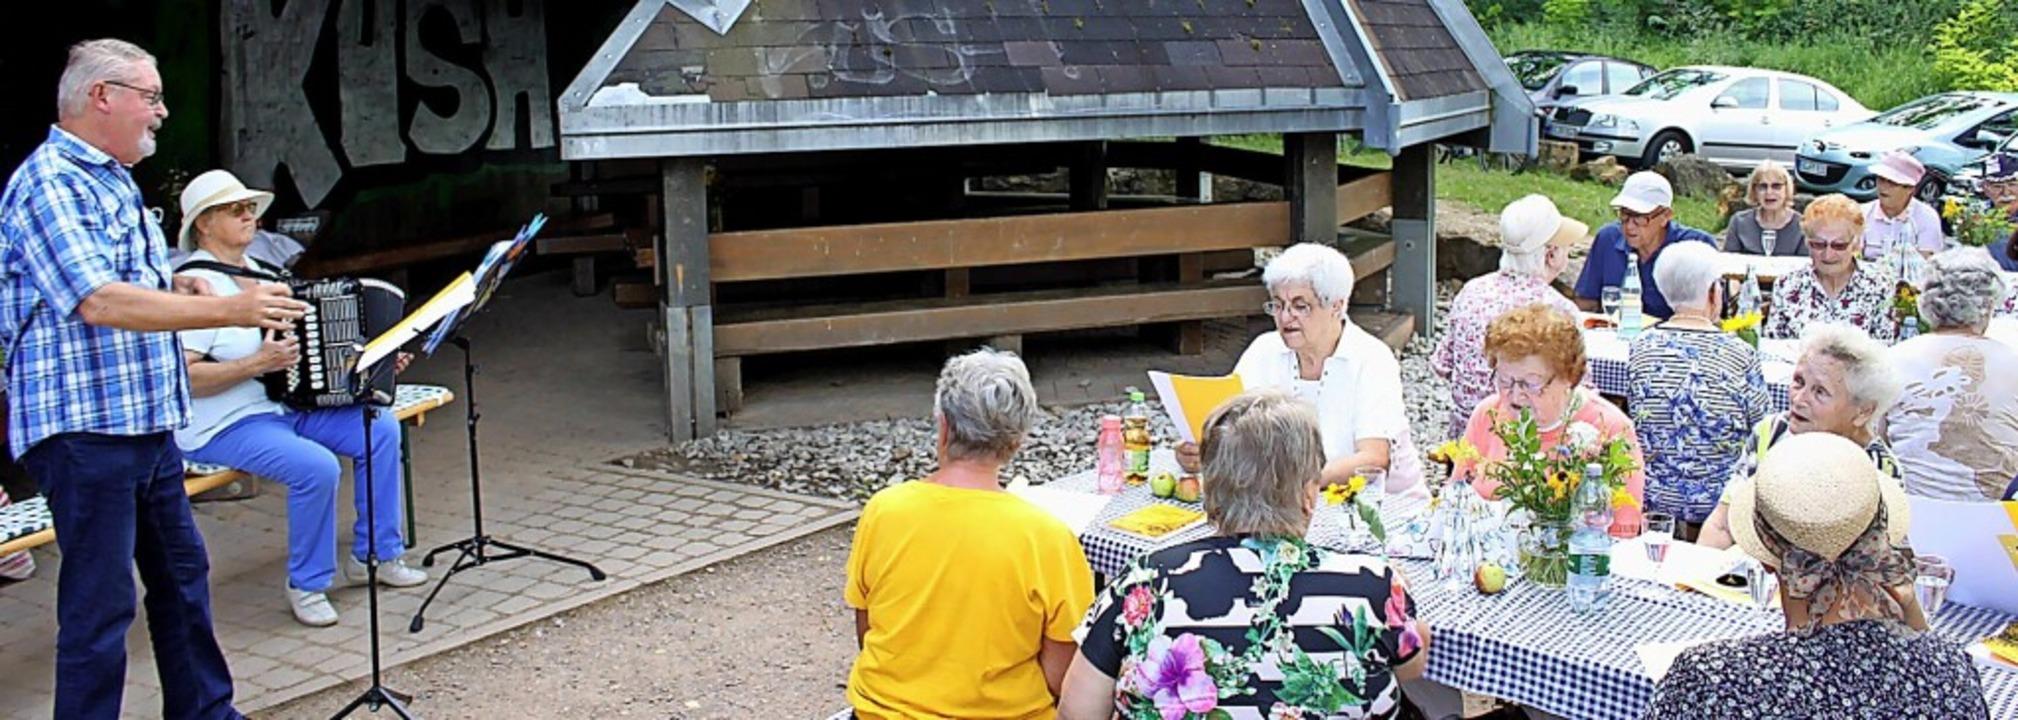 <BZ-FotoAnlauf>Ringsheim:</BZ-FotoAnla...20 Seniorinnen und Senioren begrüßen.     Foto: Adelbert Mutz